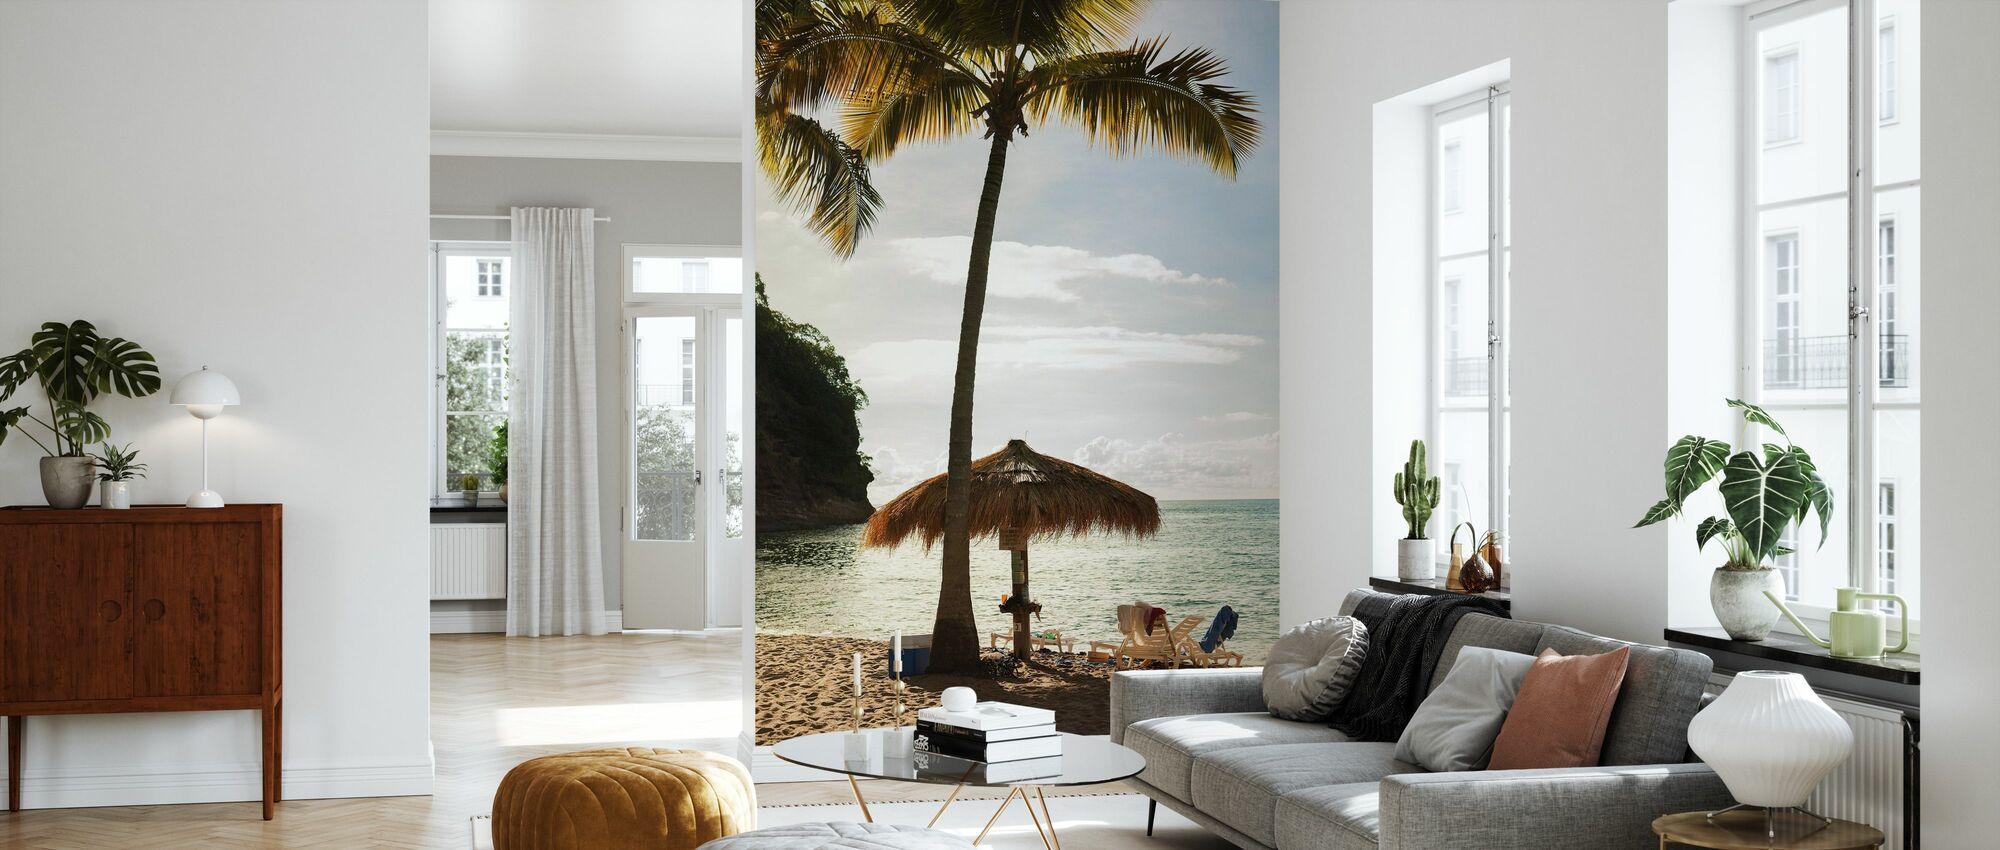 Perfecte plek in Saint Lucia, Caraïben - Behang - Woonkamer